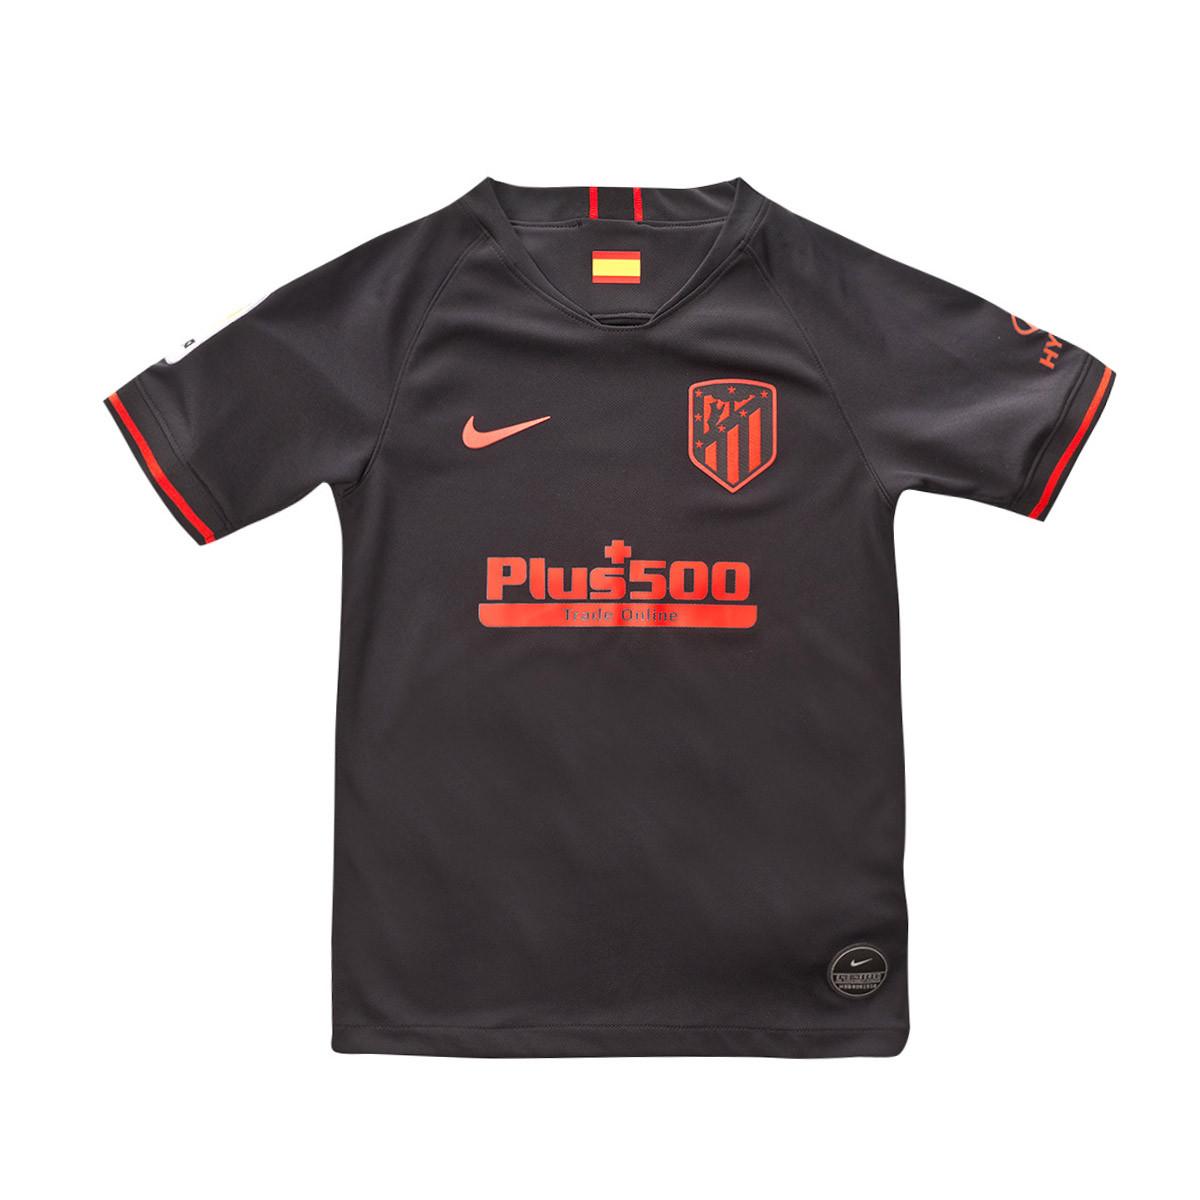 زقزقة أداة مركزية تلعب دور ا مهم ا انفجار Camiseta Nike Atletico De Madrid Pleasantgroveumc Net